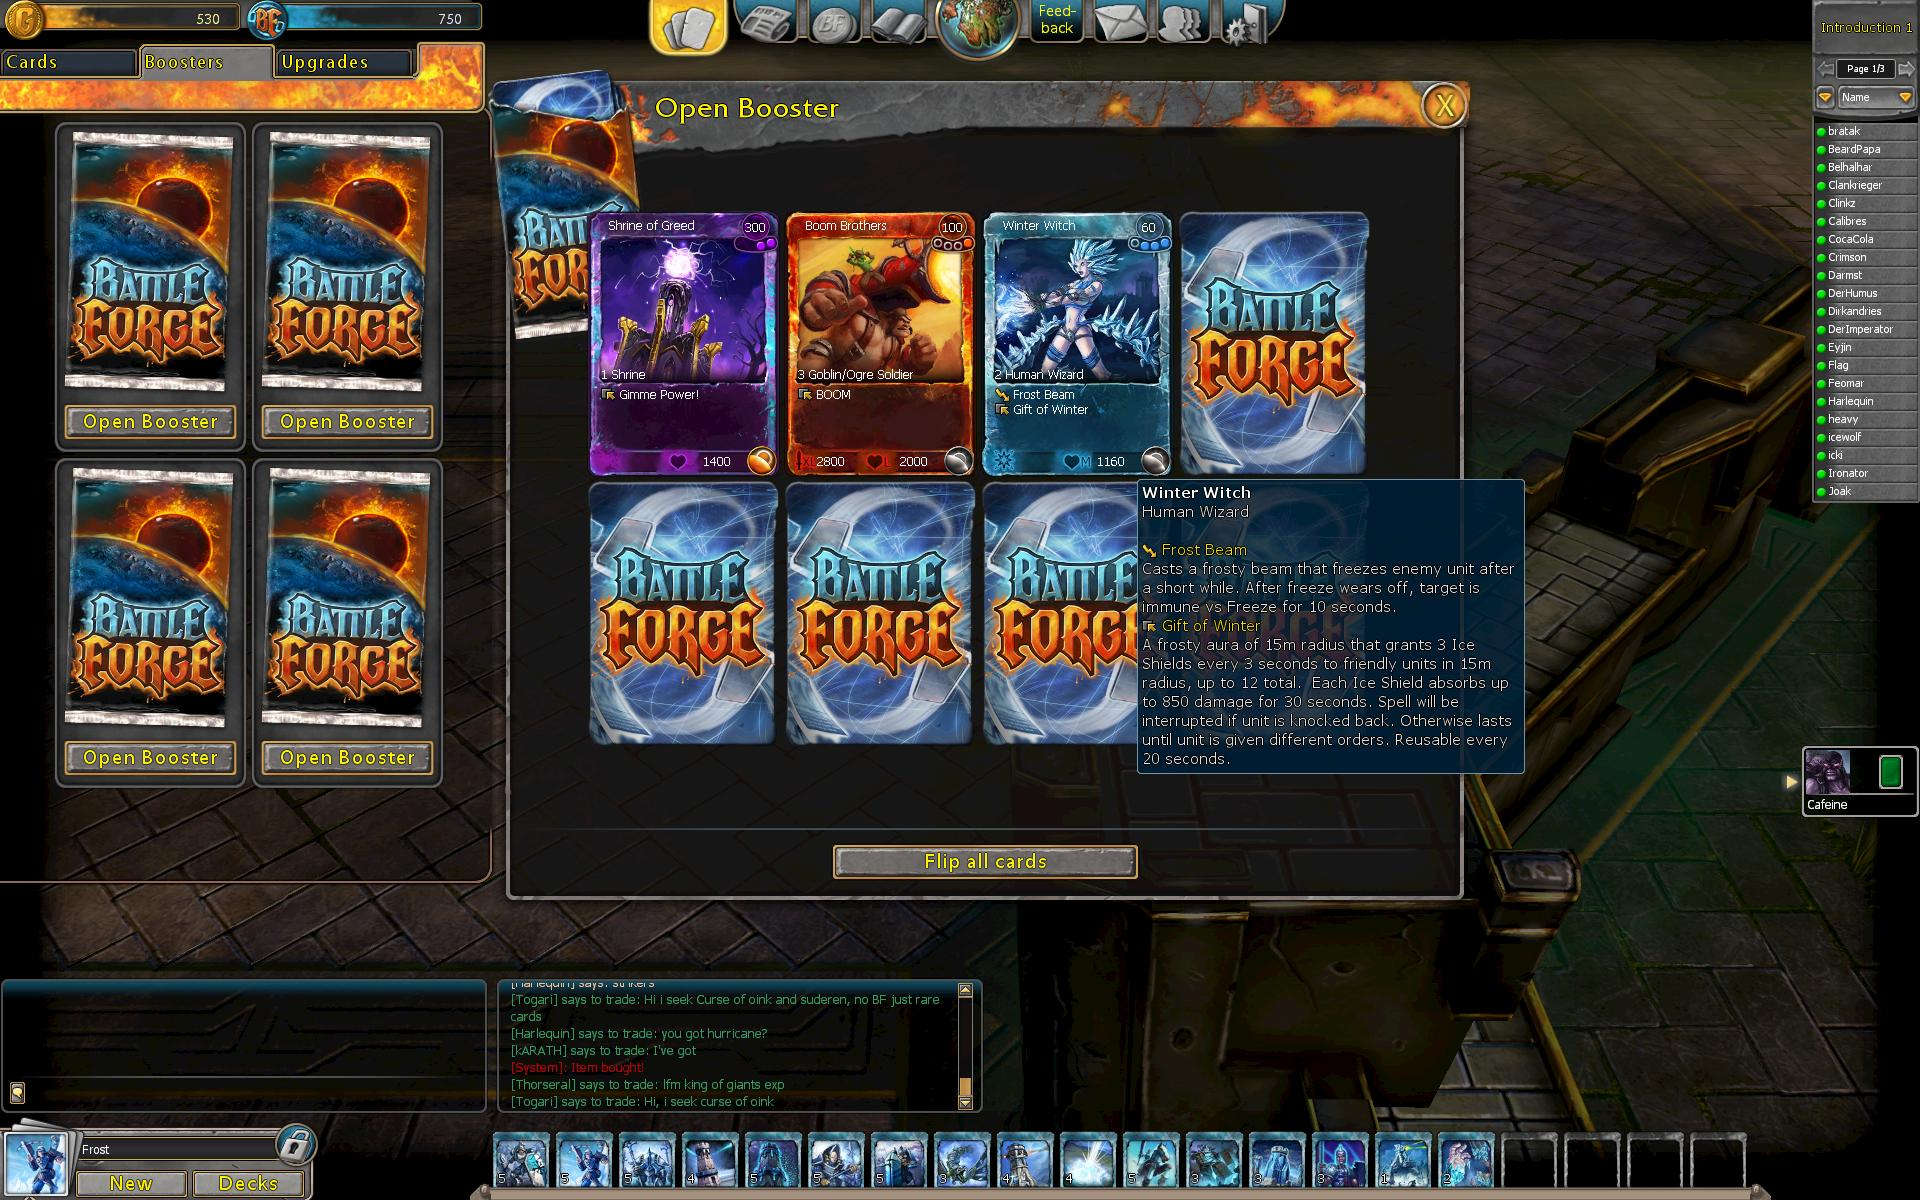 BattleForge PC Preview 04